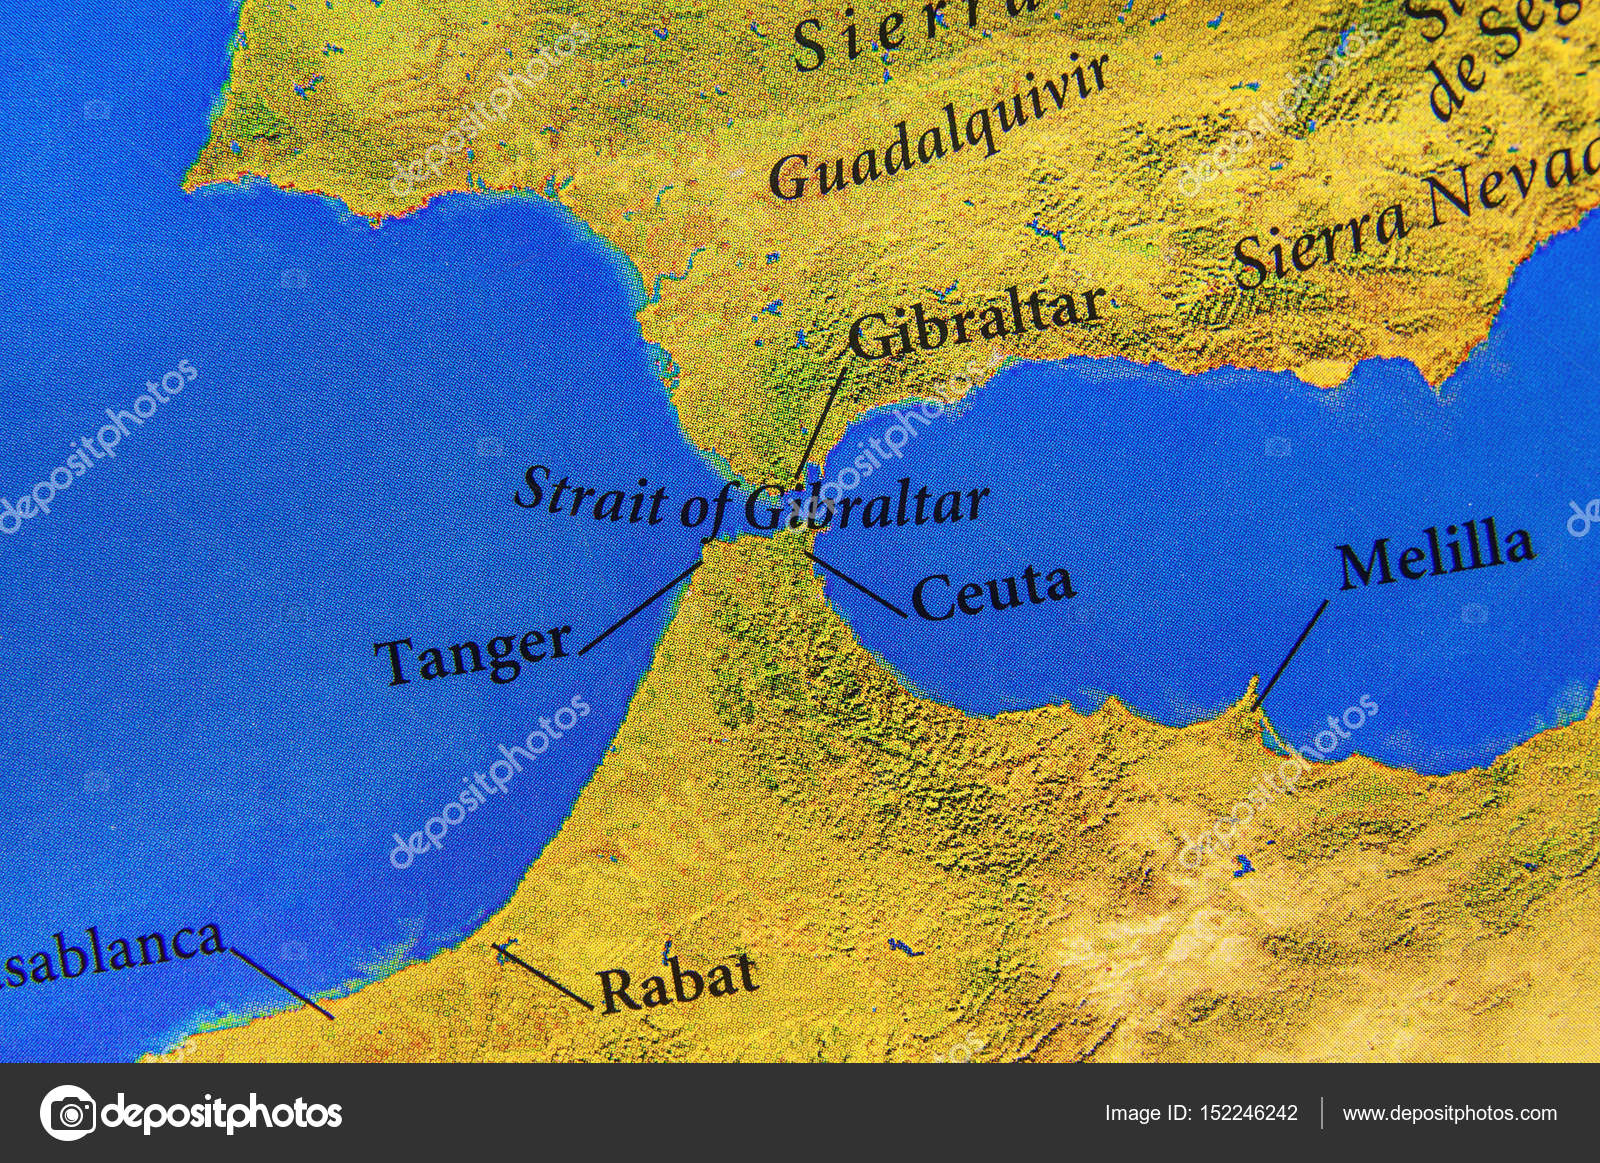 estreito gibraltar mapa Mapa geográfico Europeu estreito de Gibraltar — Stock Photo  estreito gibraltar mapa